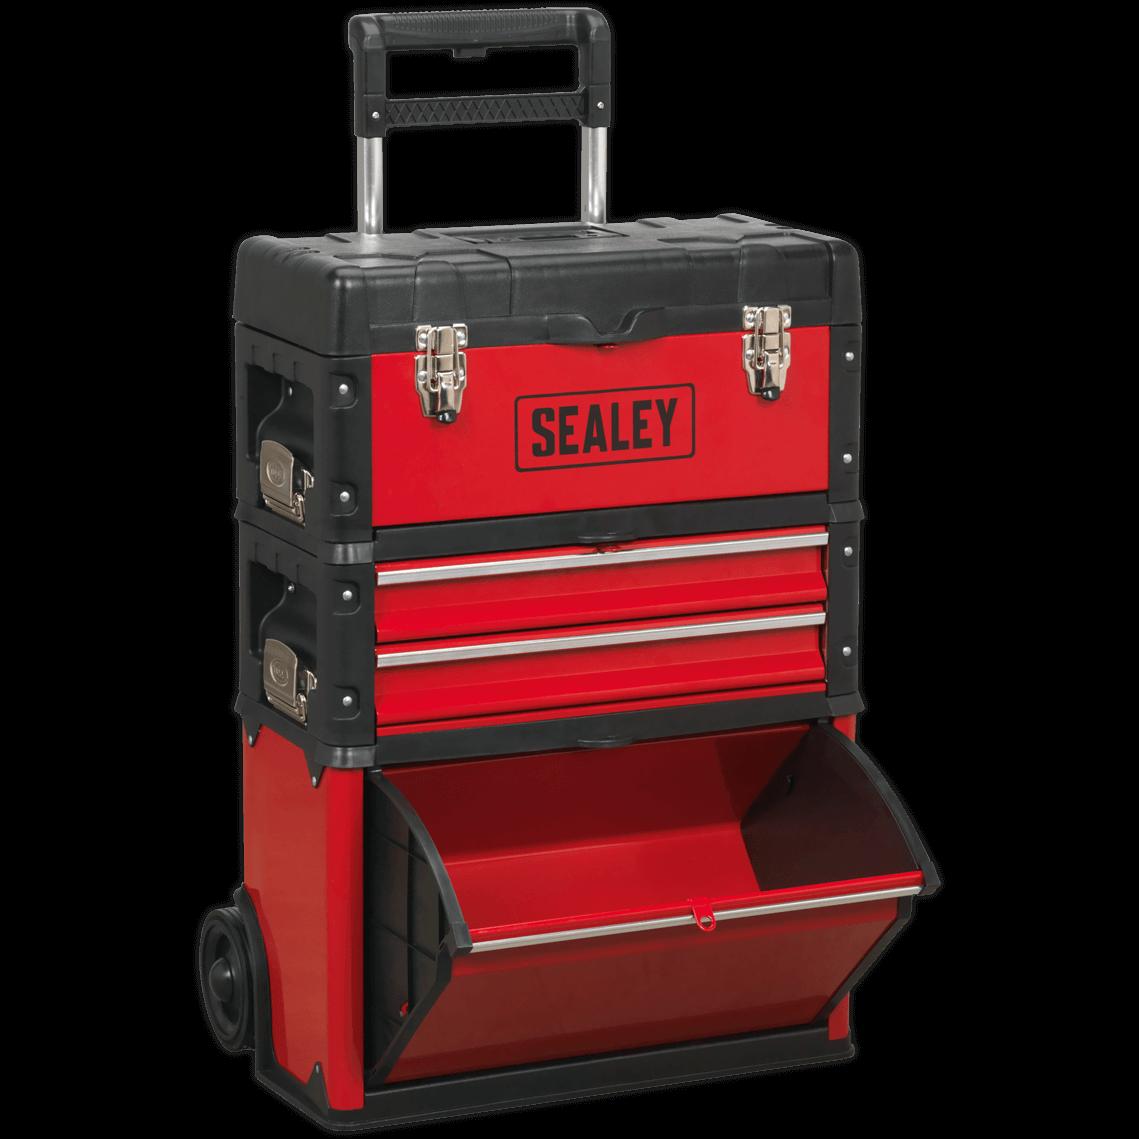 Sealey AP20 Wheeled Mobile Tool Box   Tool Boxes